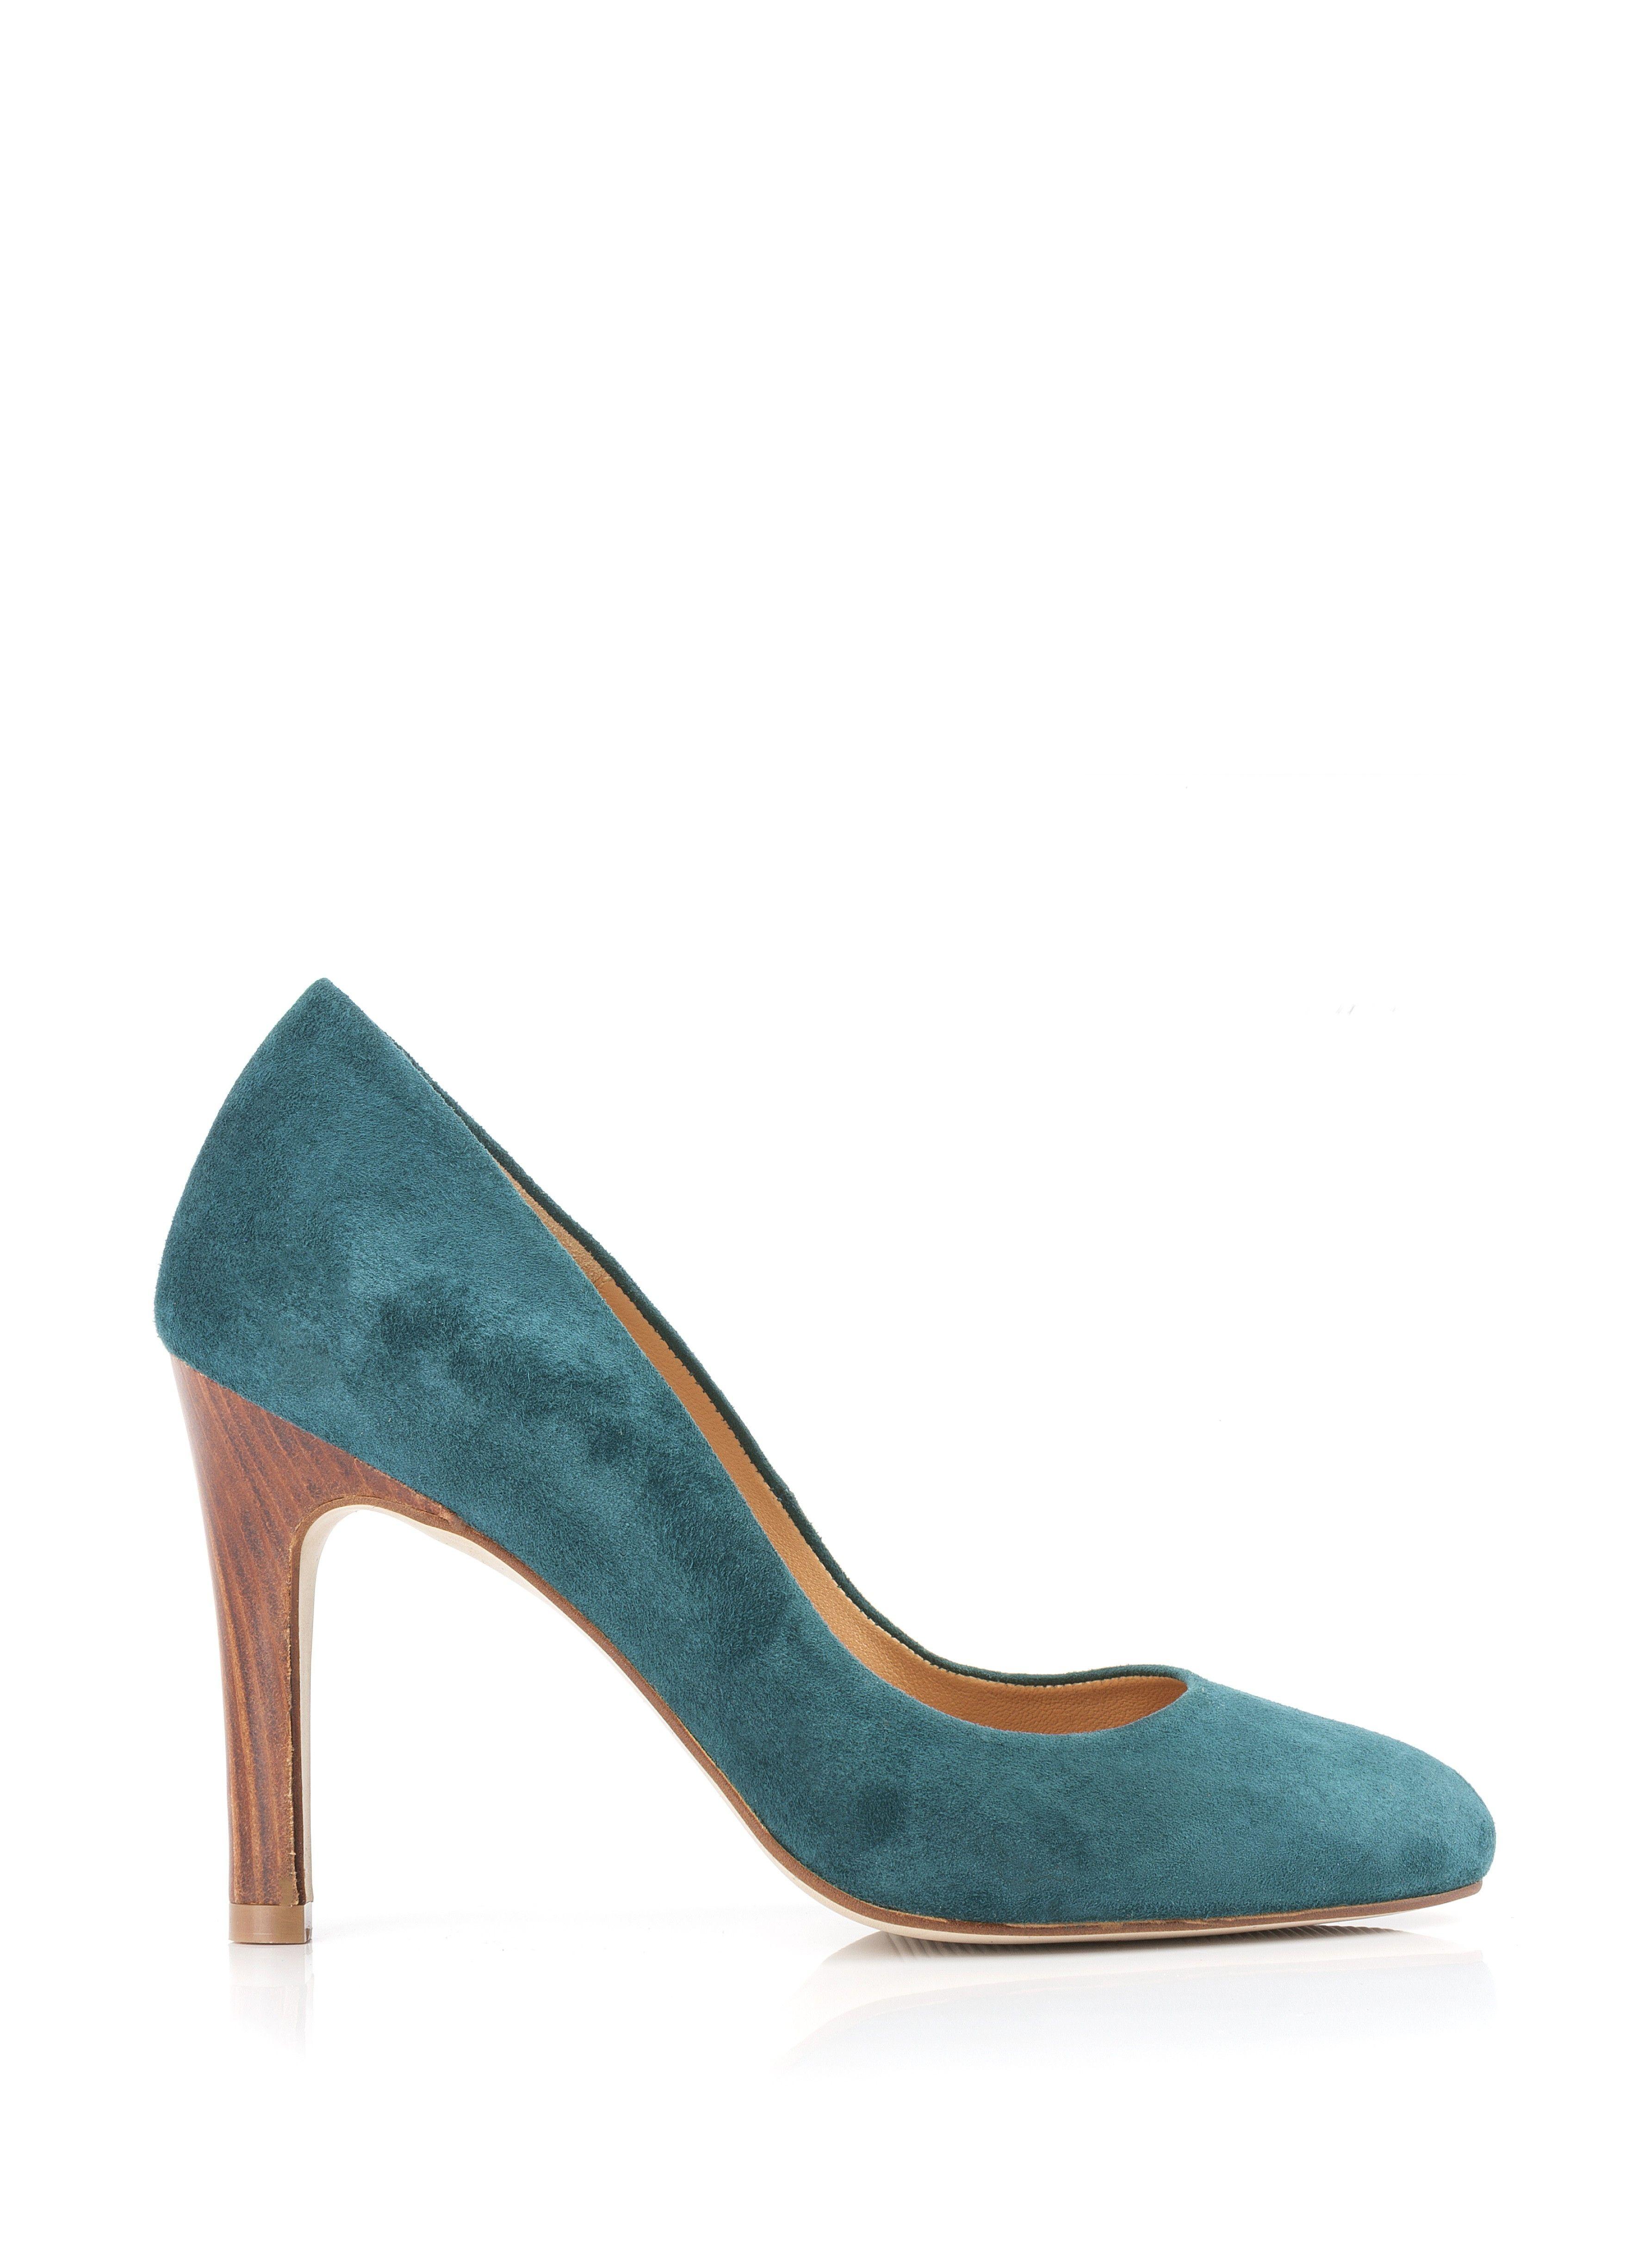 Escarpins HIGHEST HEEL sexy chic vernis bleu canard Teal Pat P. 40 7U6eJ